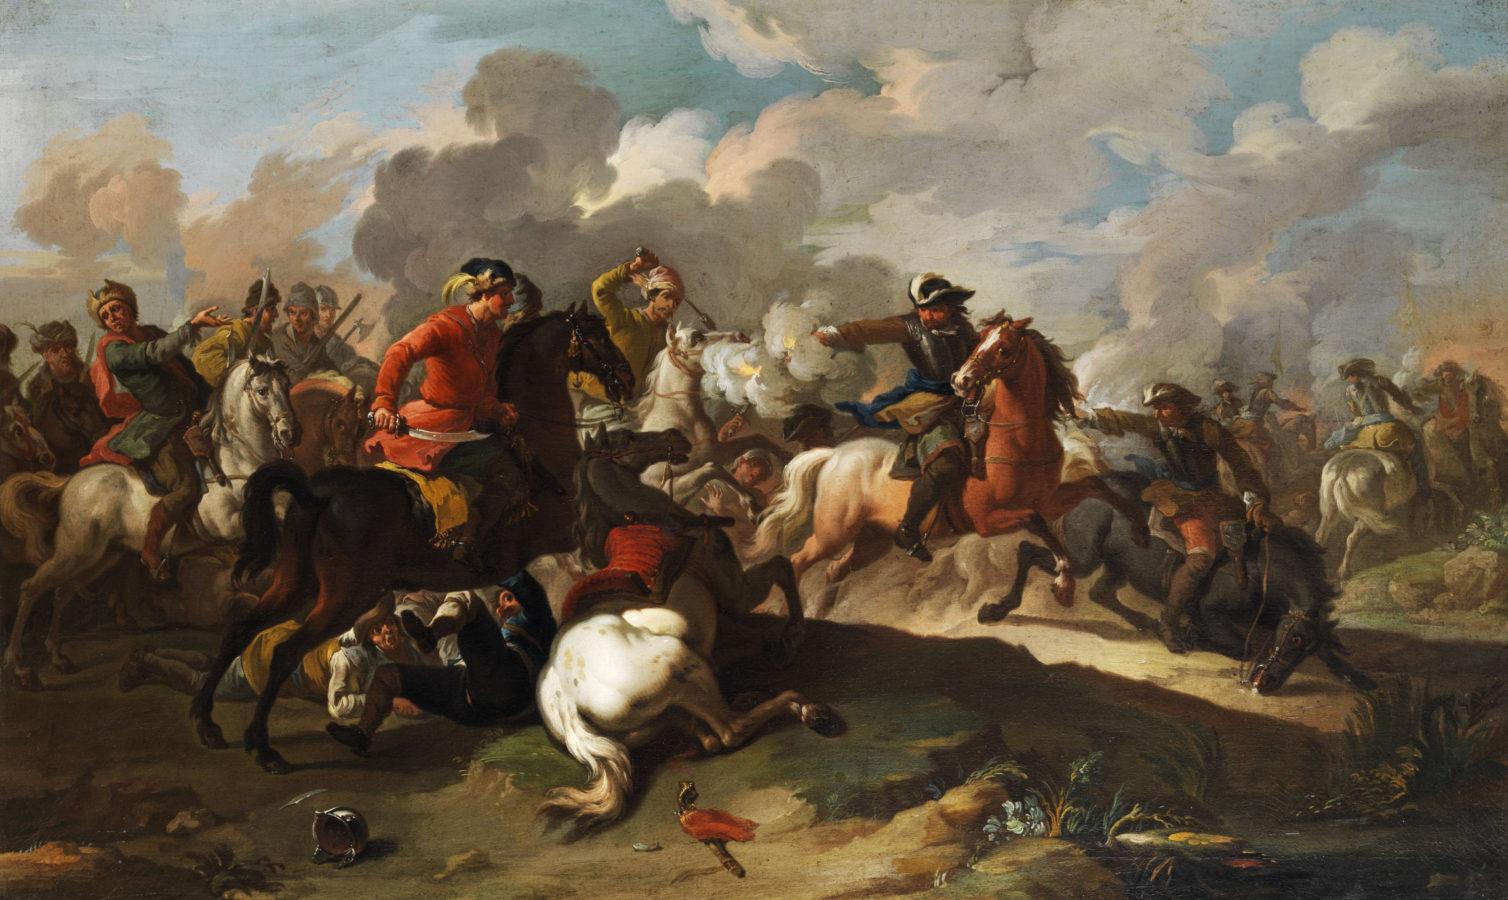 Francesco Casanova Battaglia di cavalleria casanova brothers